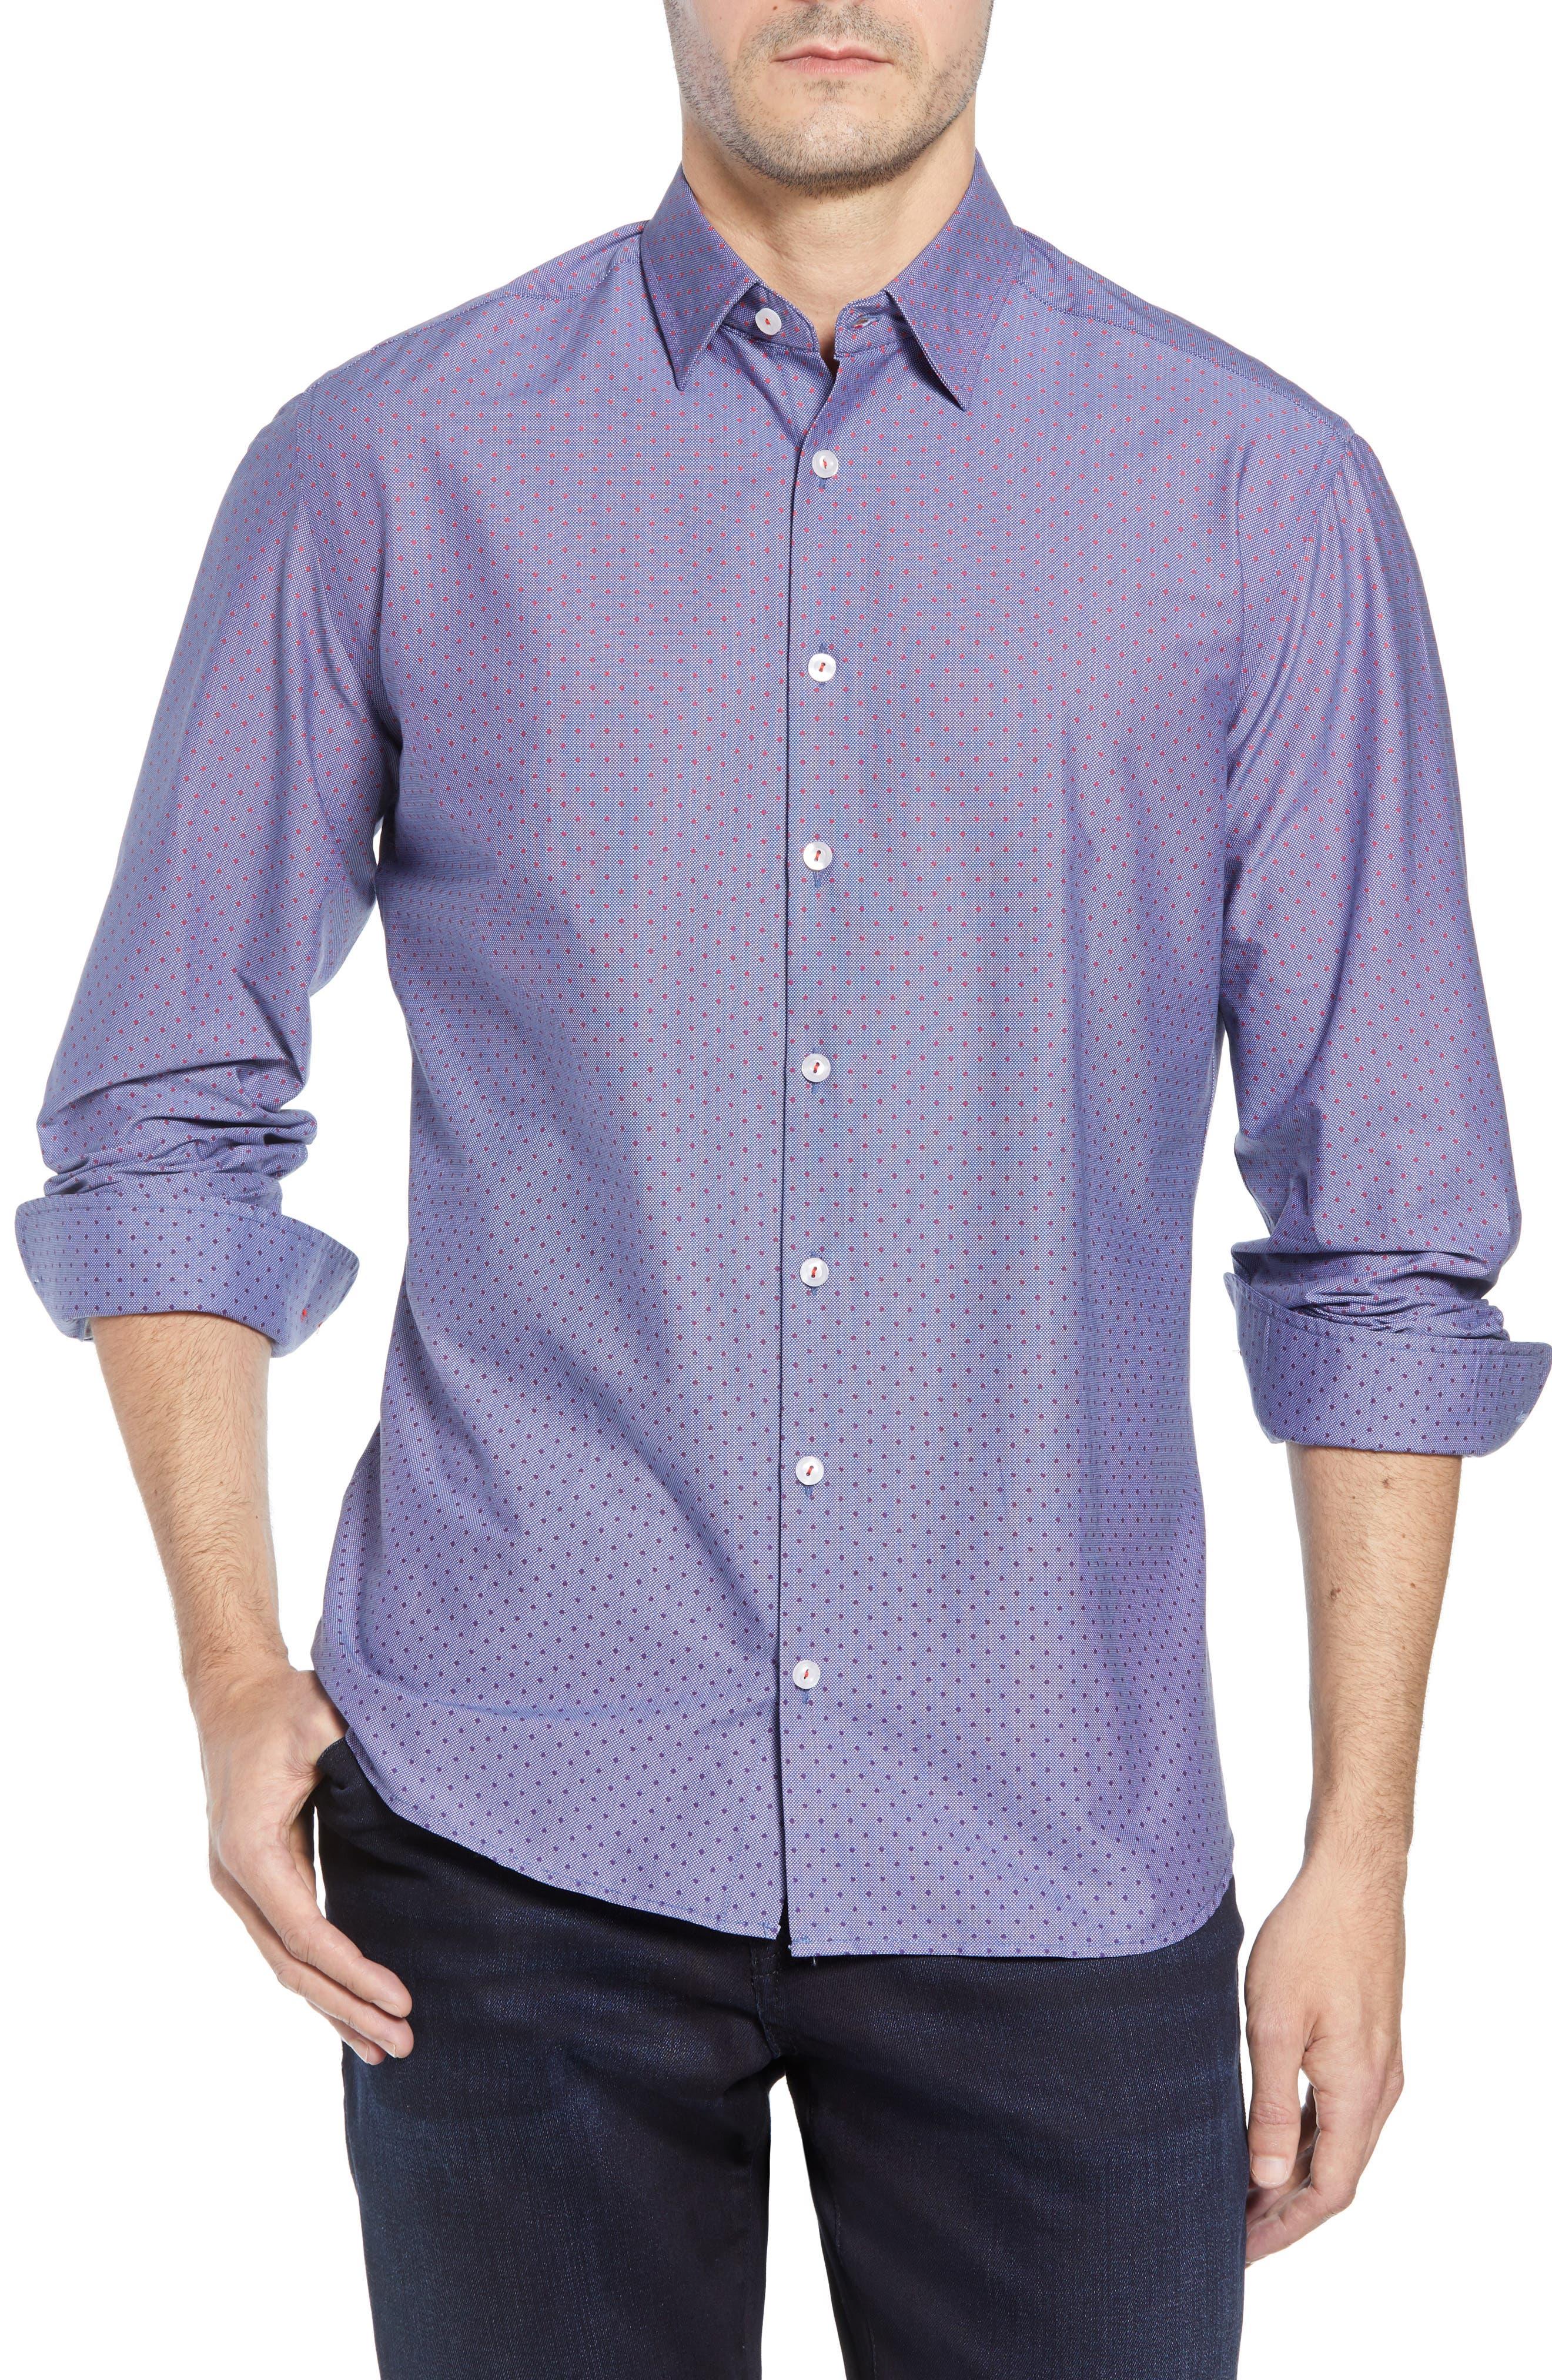 STONE ROSE Gradient Dot Regular Fit Sport Shirt, Main, color, 400